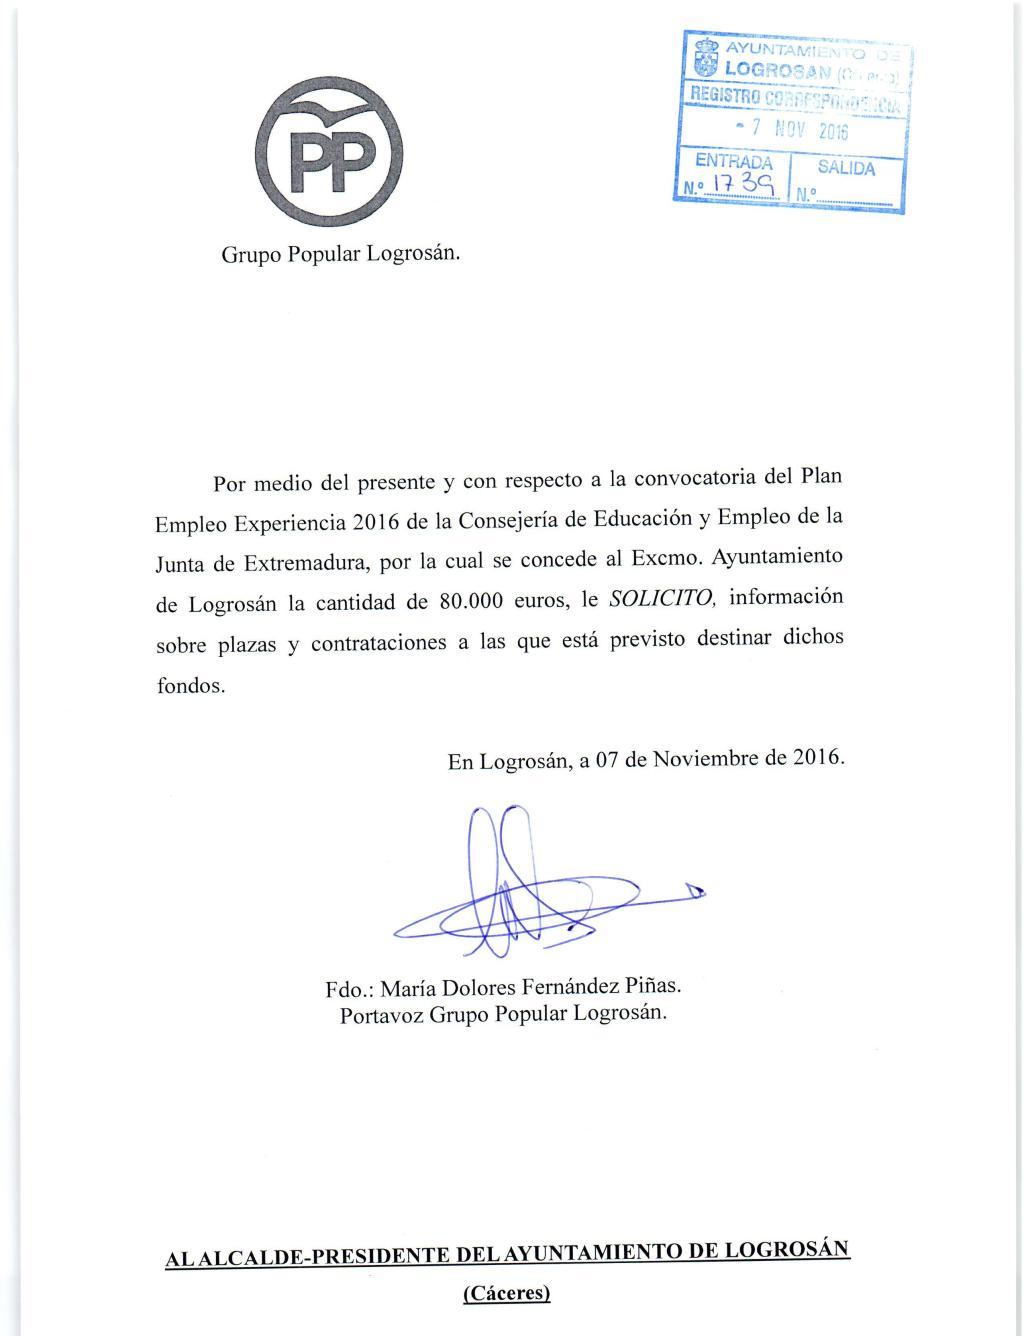 peticion-pp